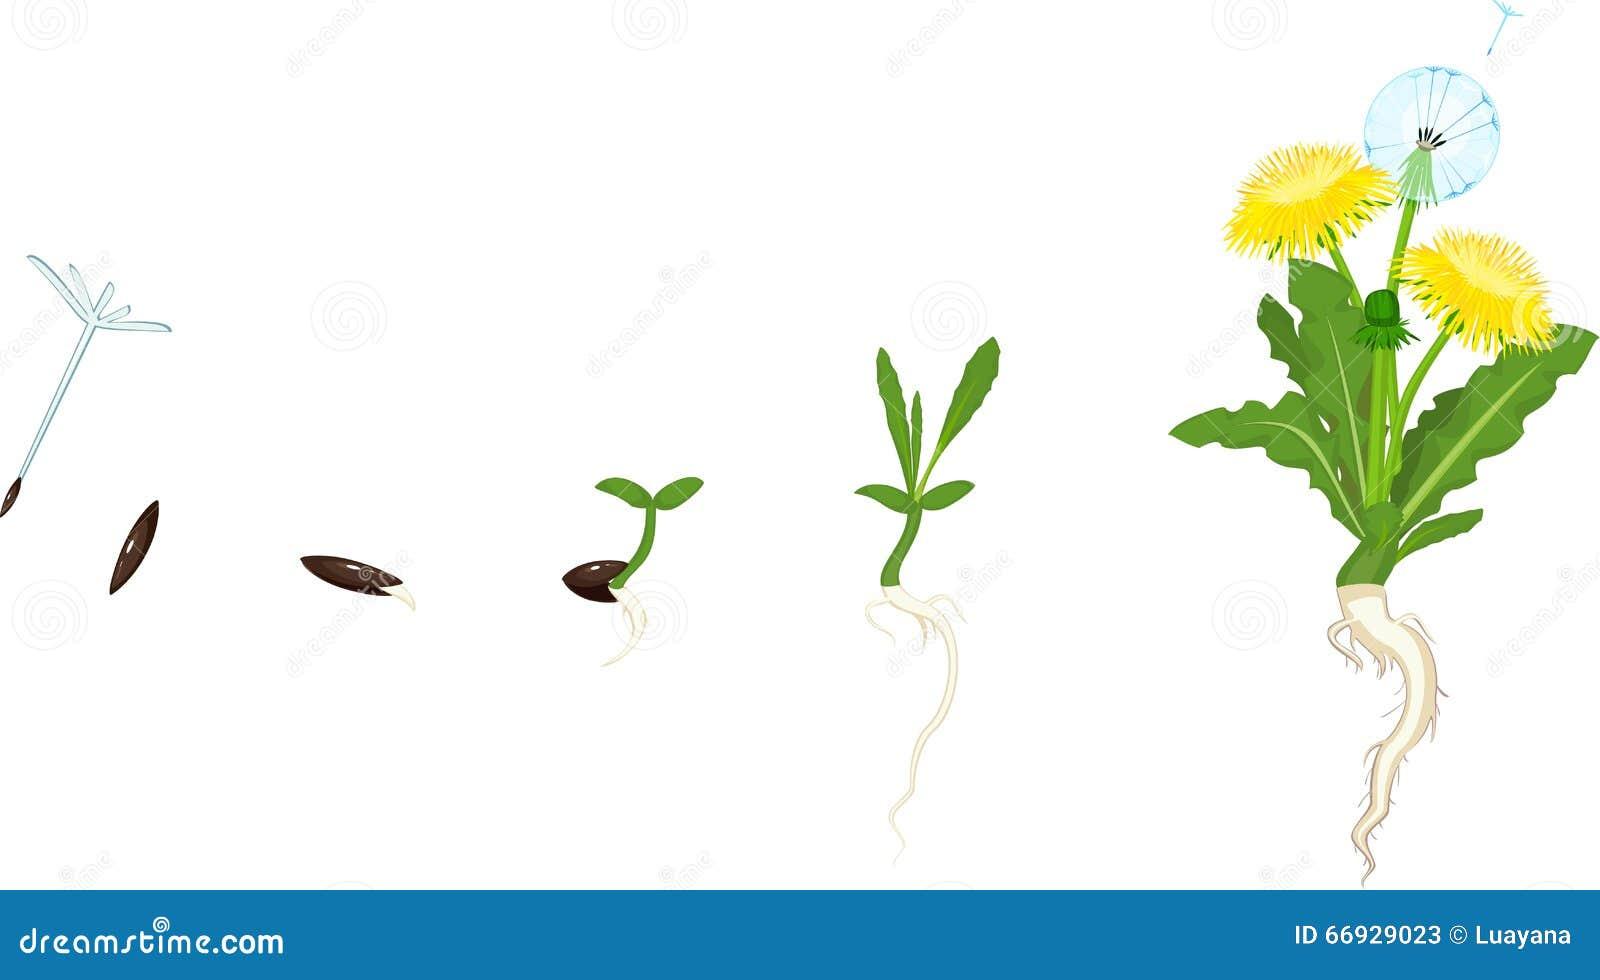 Life Cycle Of Dandelion Stock Vector - Image: 66929023